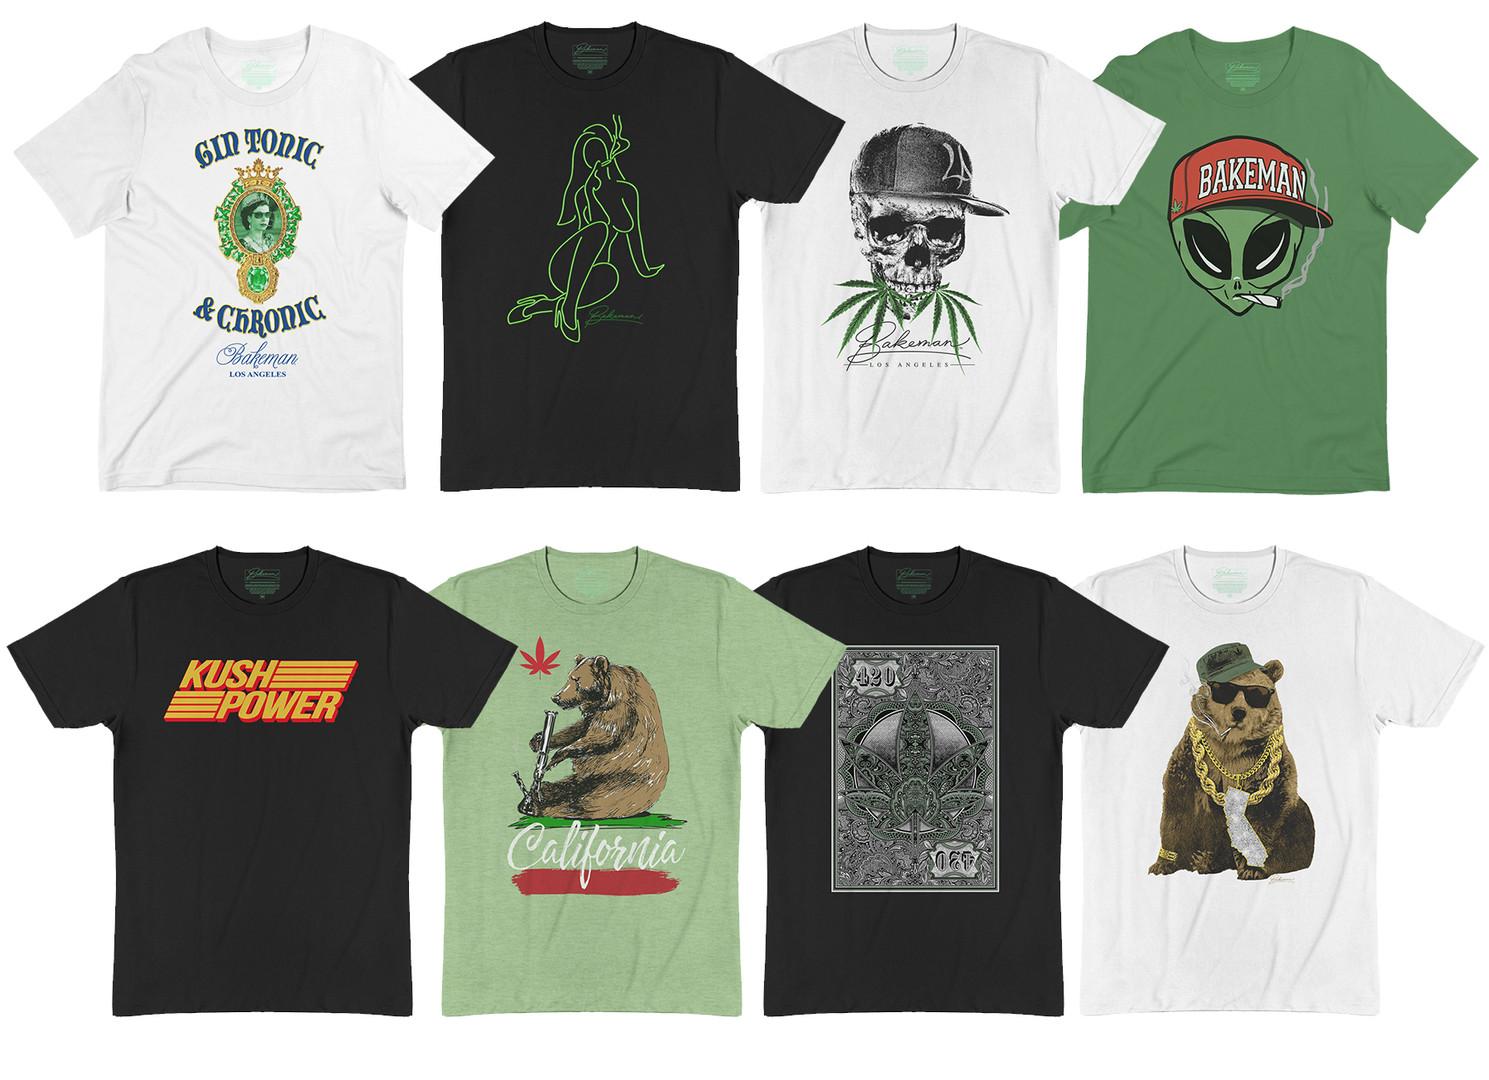 Art Direction & Graphic development for Bakeman Los Angeles brand sold online.